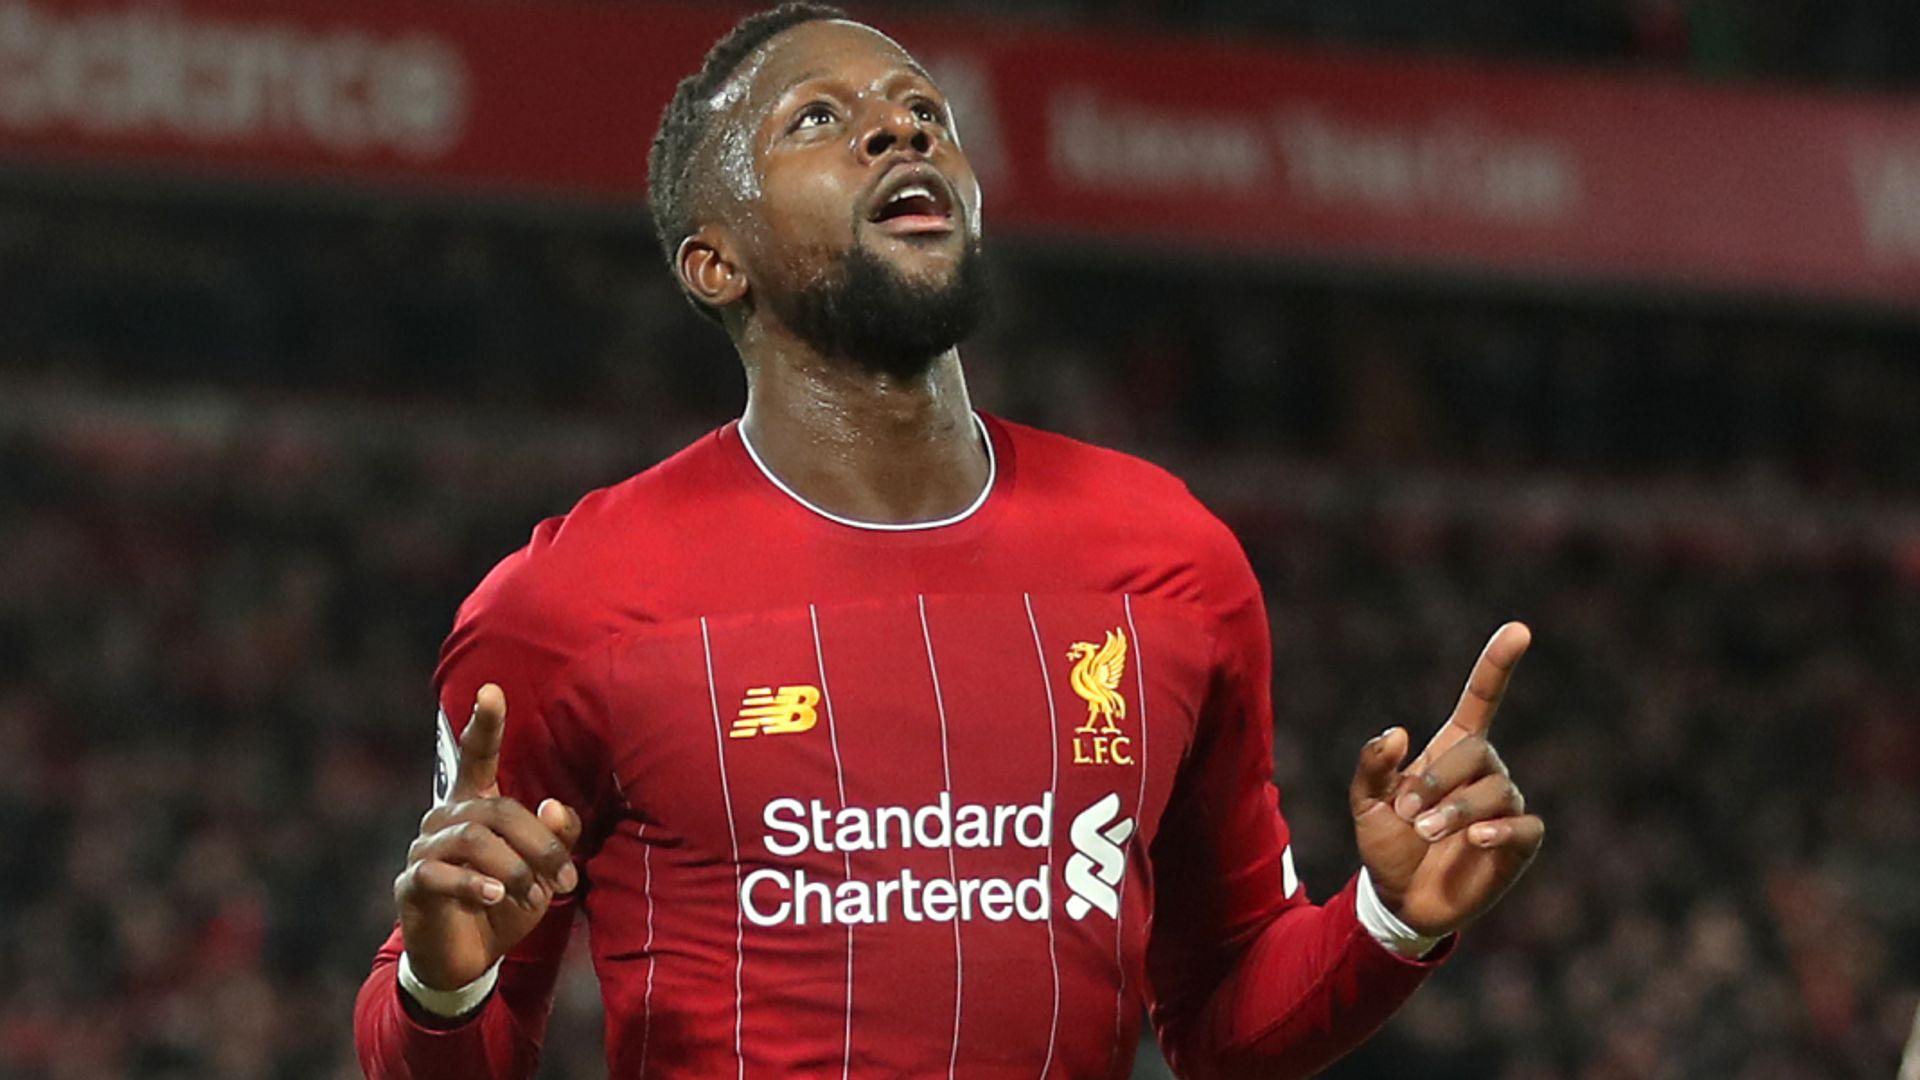 Origi out to continue progress at Liverpool